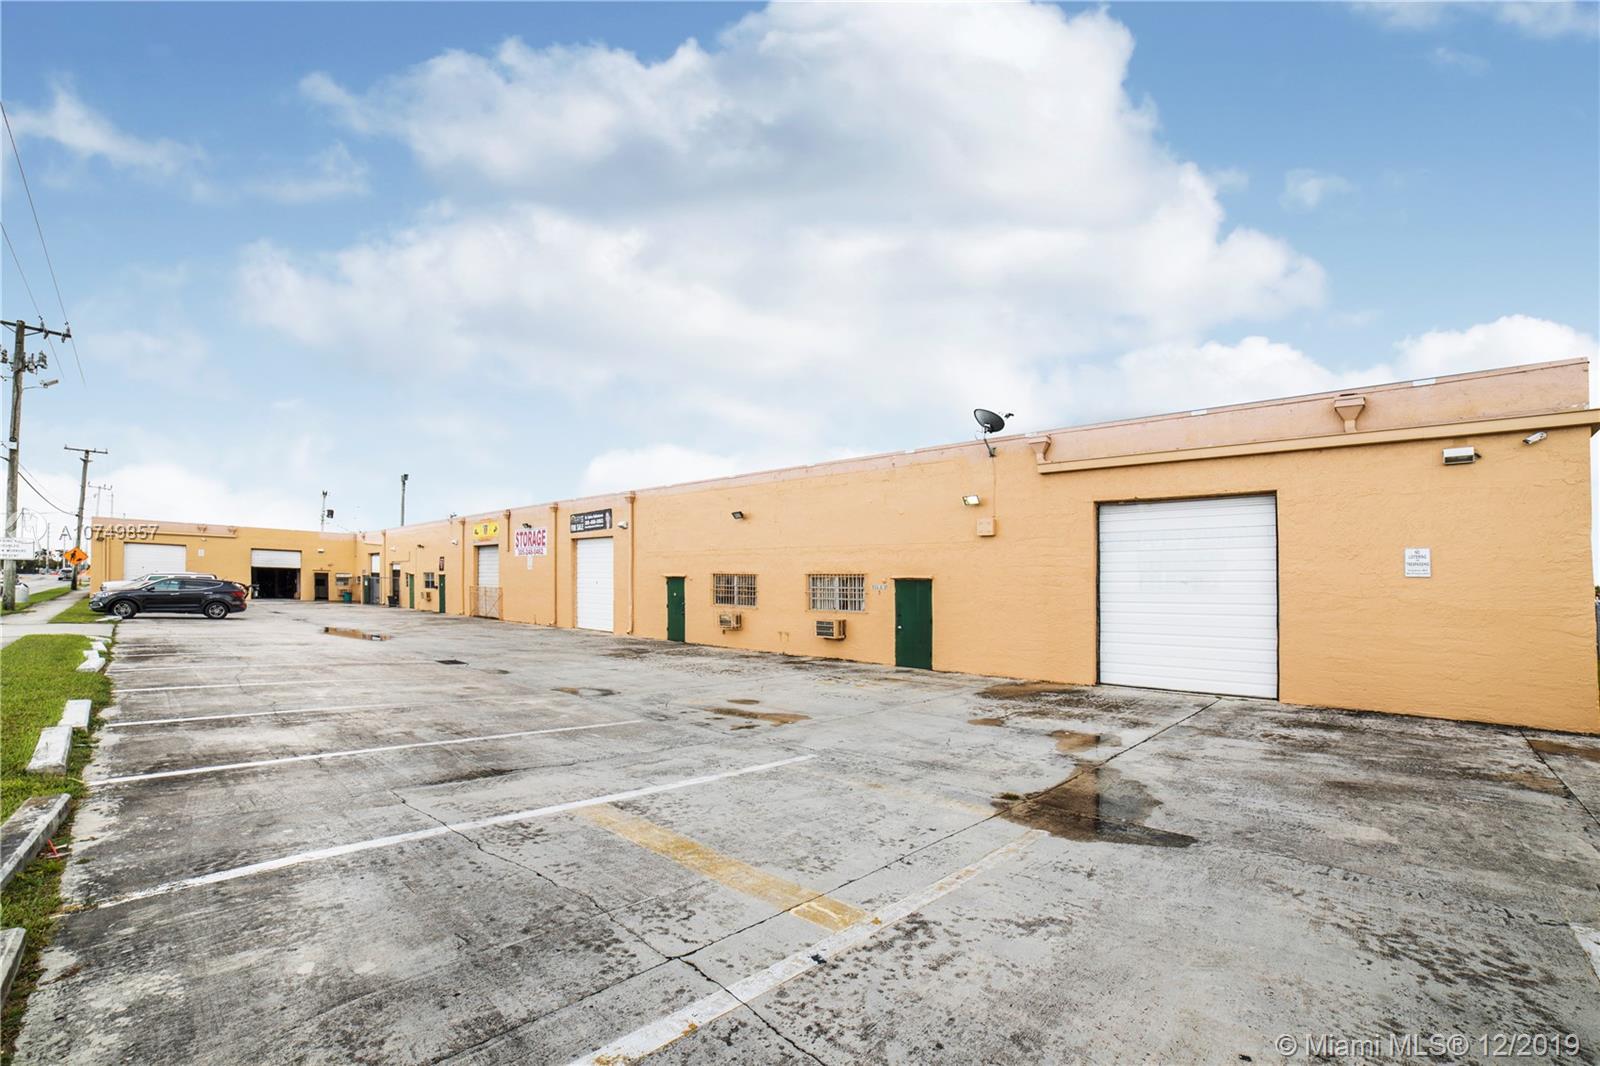 5 E Lucy St, Florida City, FL 33034